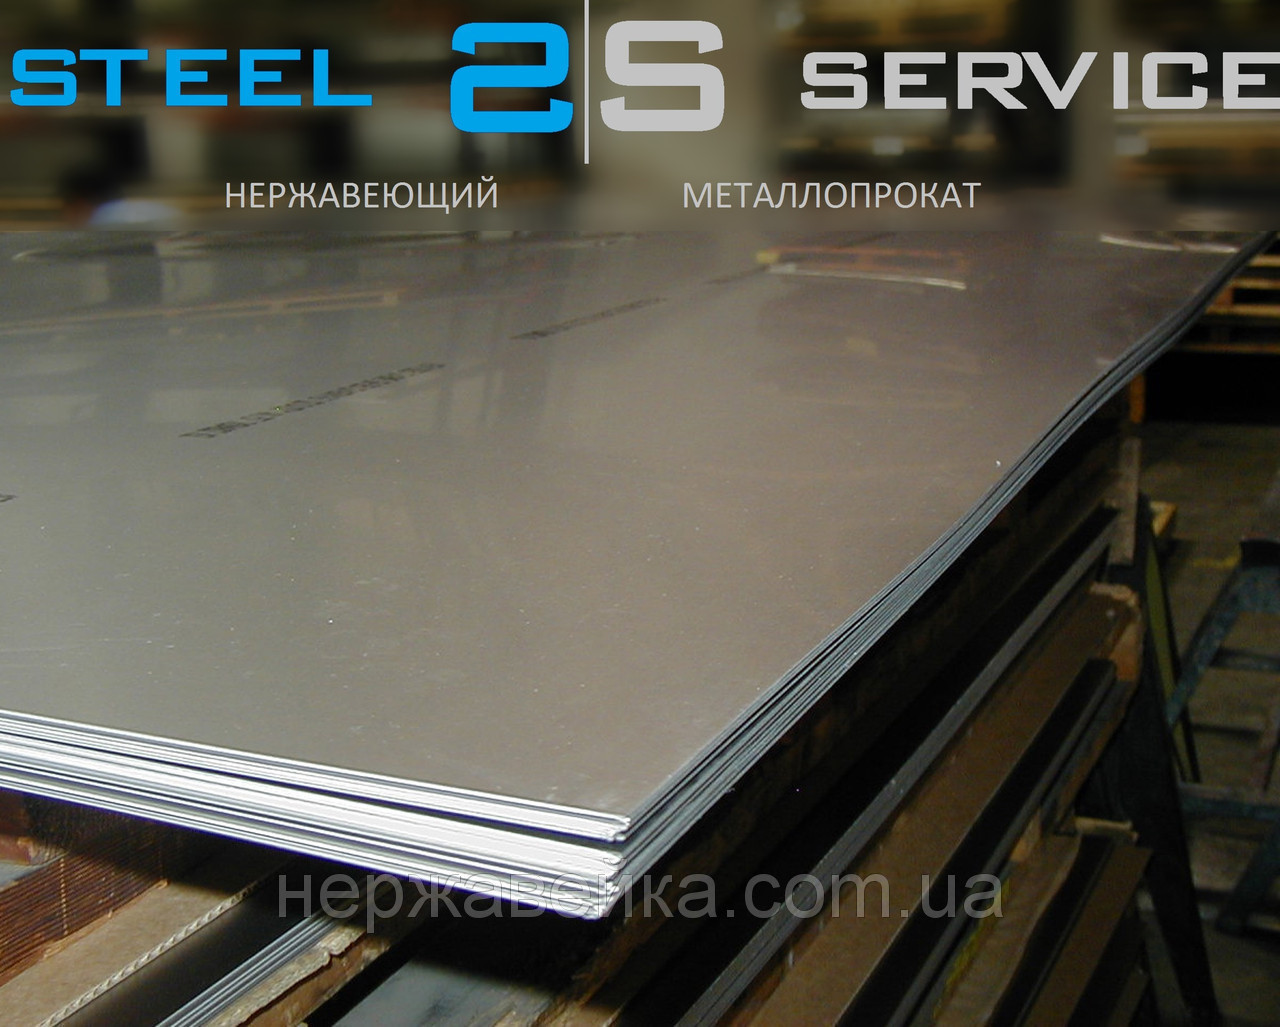 Нержавейка лист 14х1500х3000мм  AISI 316L(03Х17Н14М3) F1 - горячекатанный,  кислотостойкий